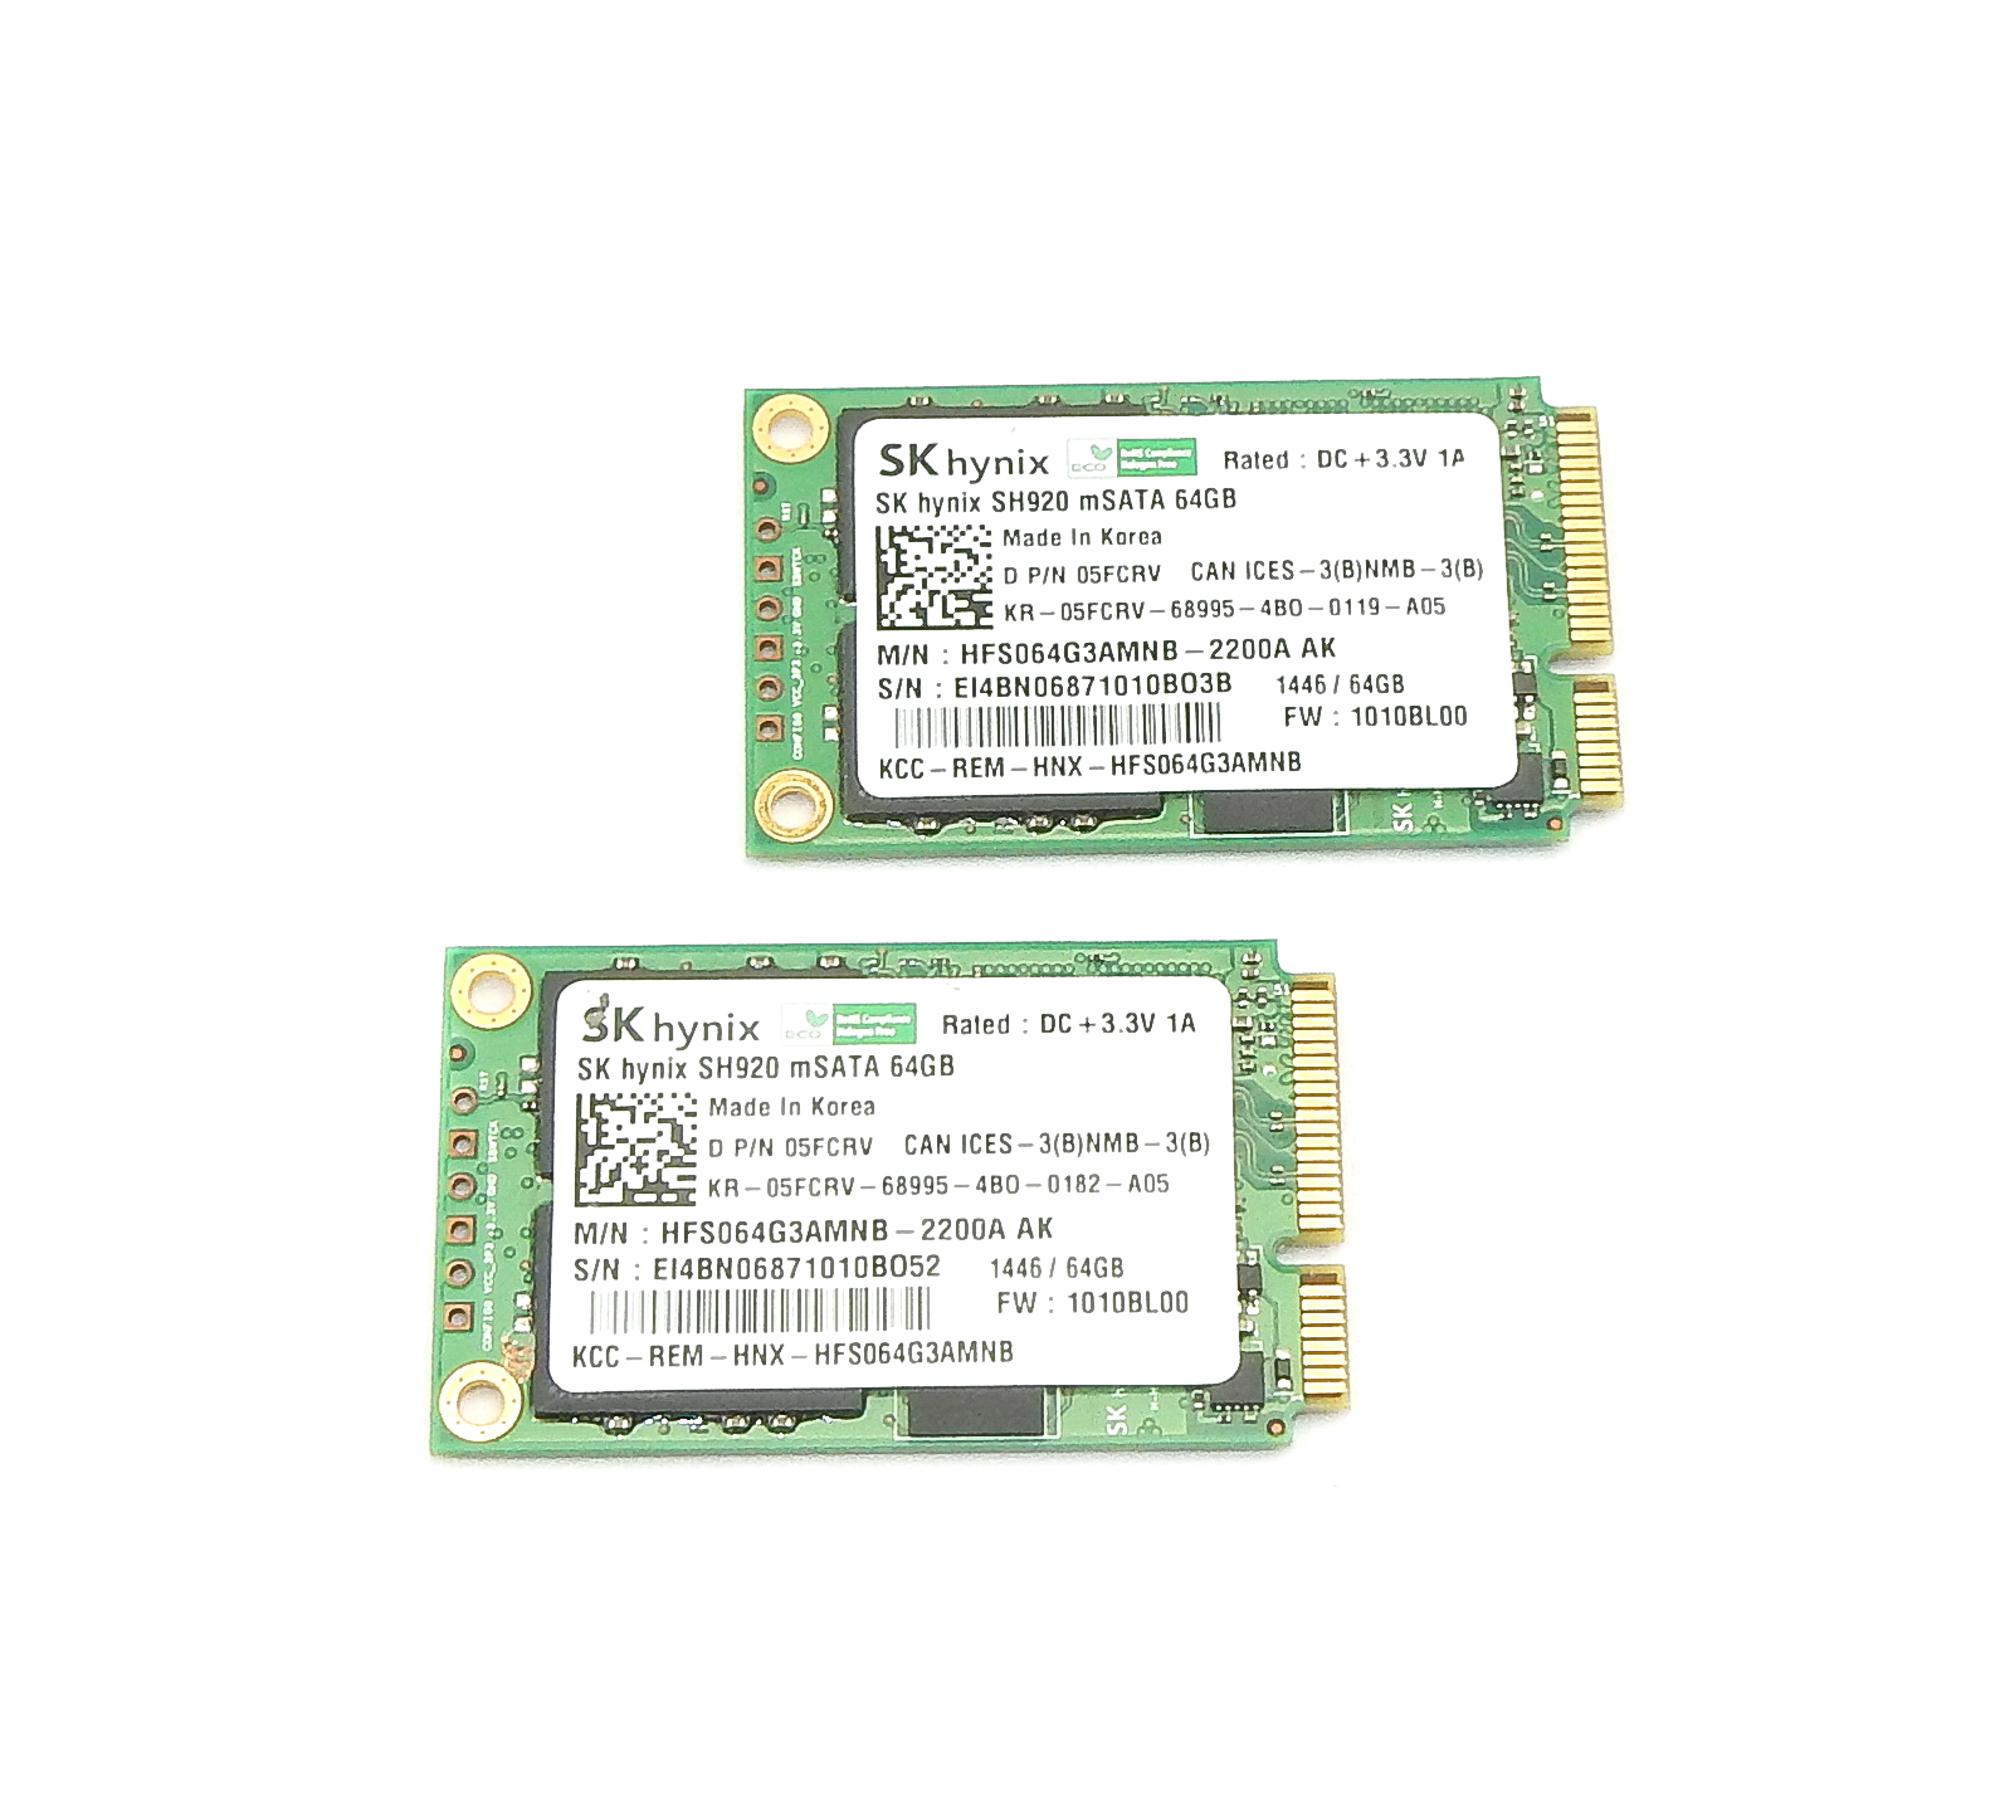 2x Dell 5FCRV SK hynix 64GB mSATA SSD HFS064G3AMNB-2200A